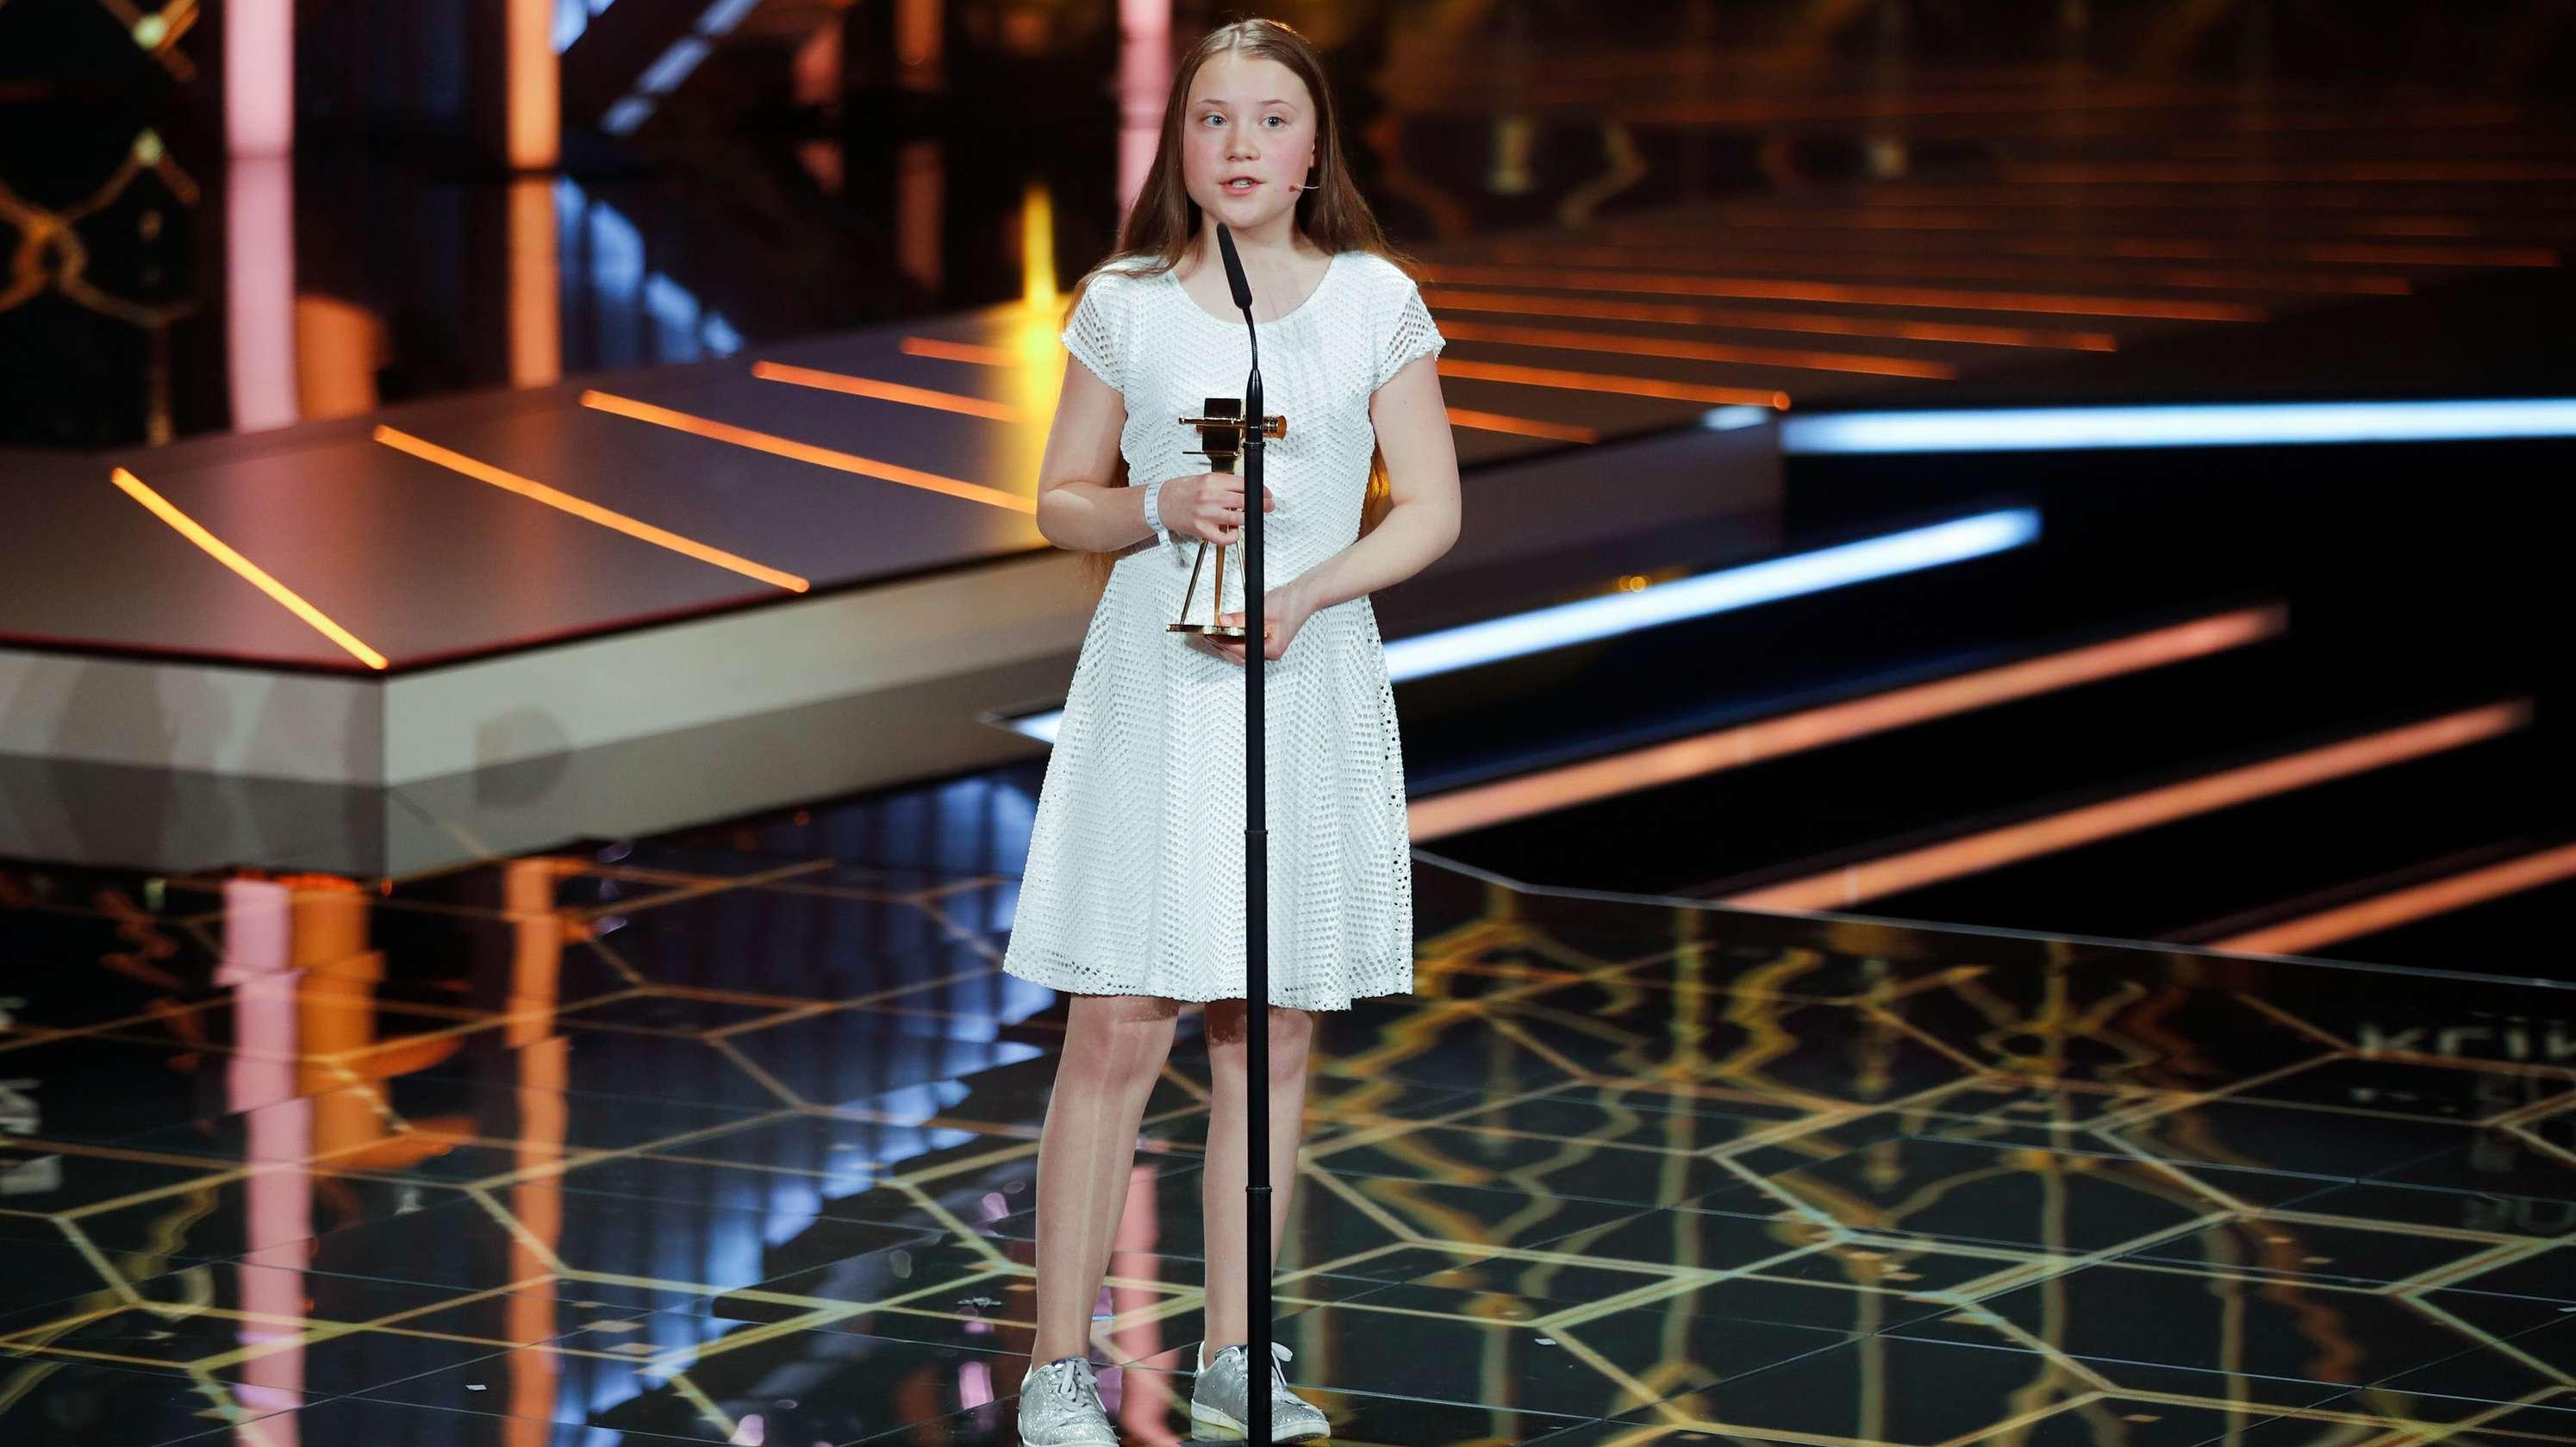 Greta Thunberg bei der Preisverleihung der Goldenen Kamera